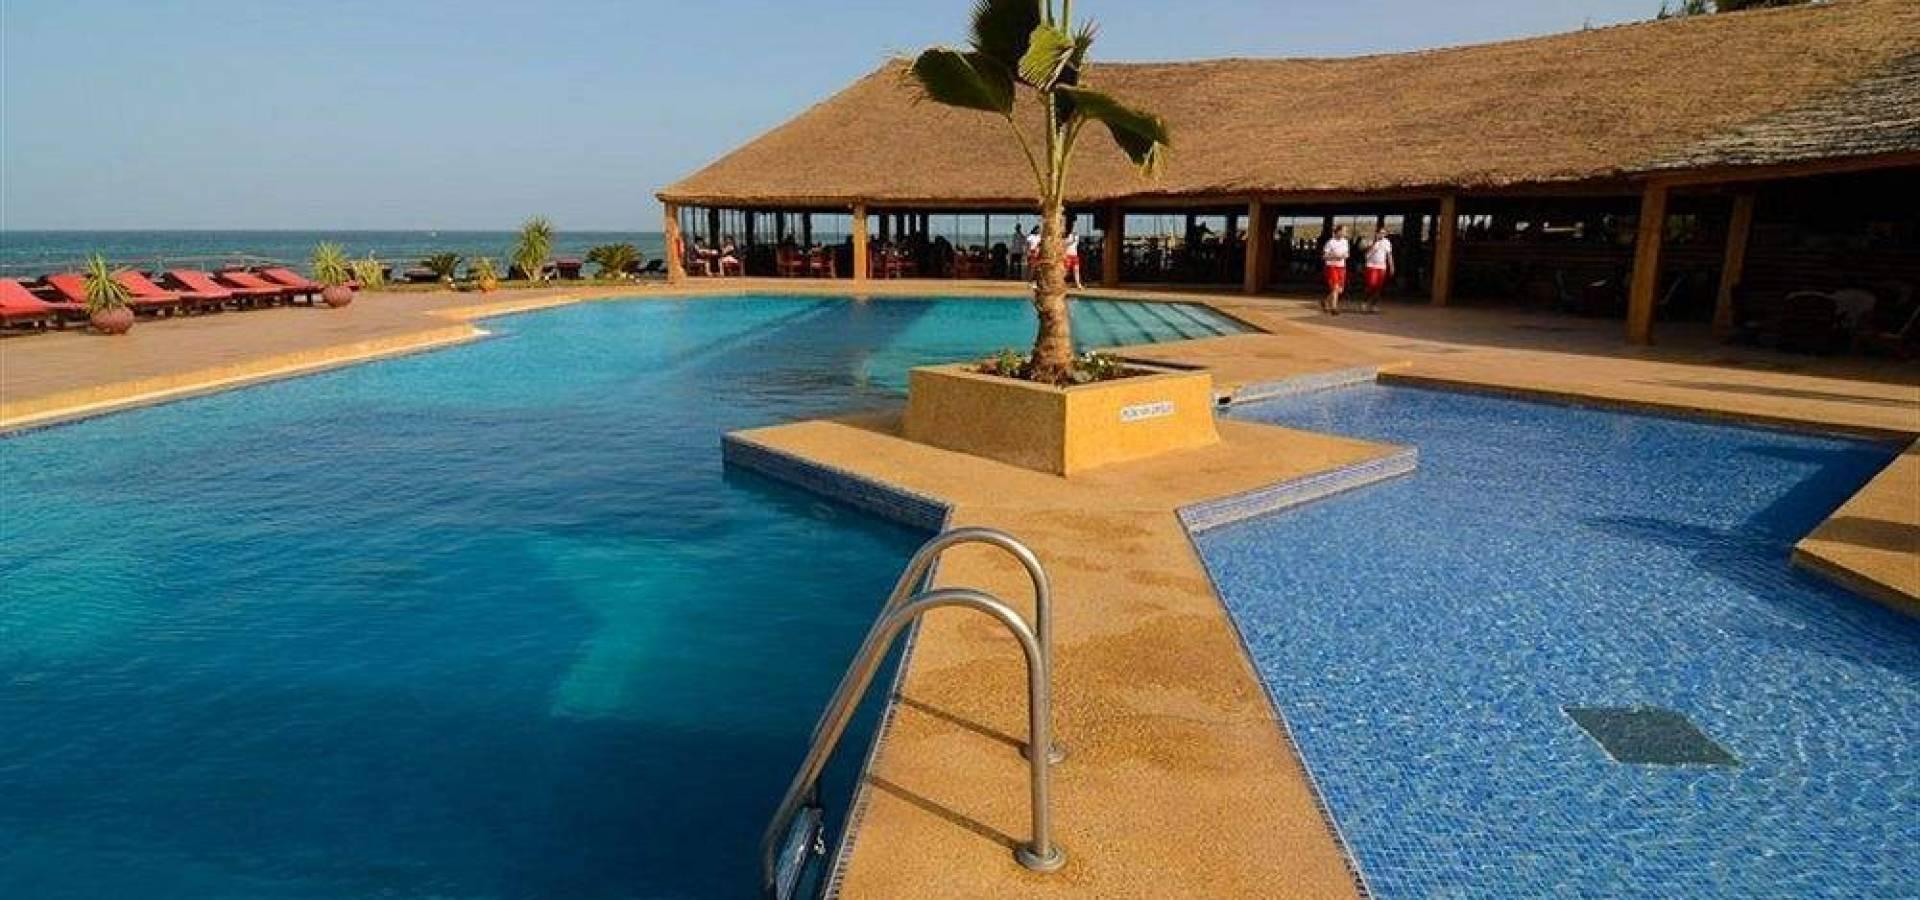 Senegal - Hotel Royal Baobab Somone